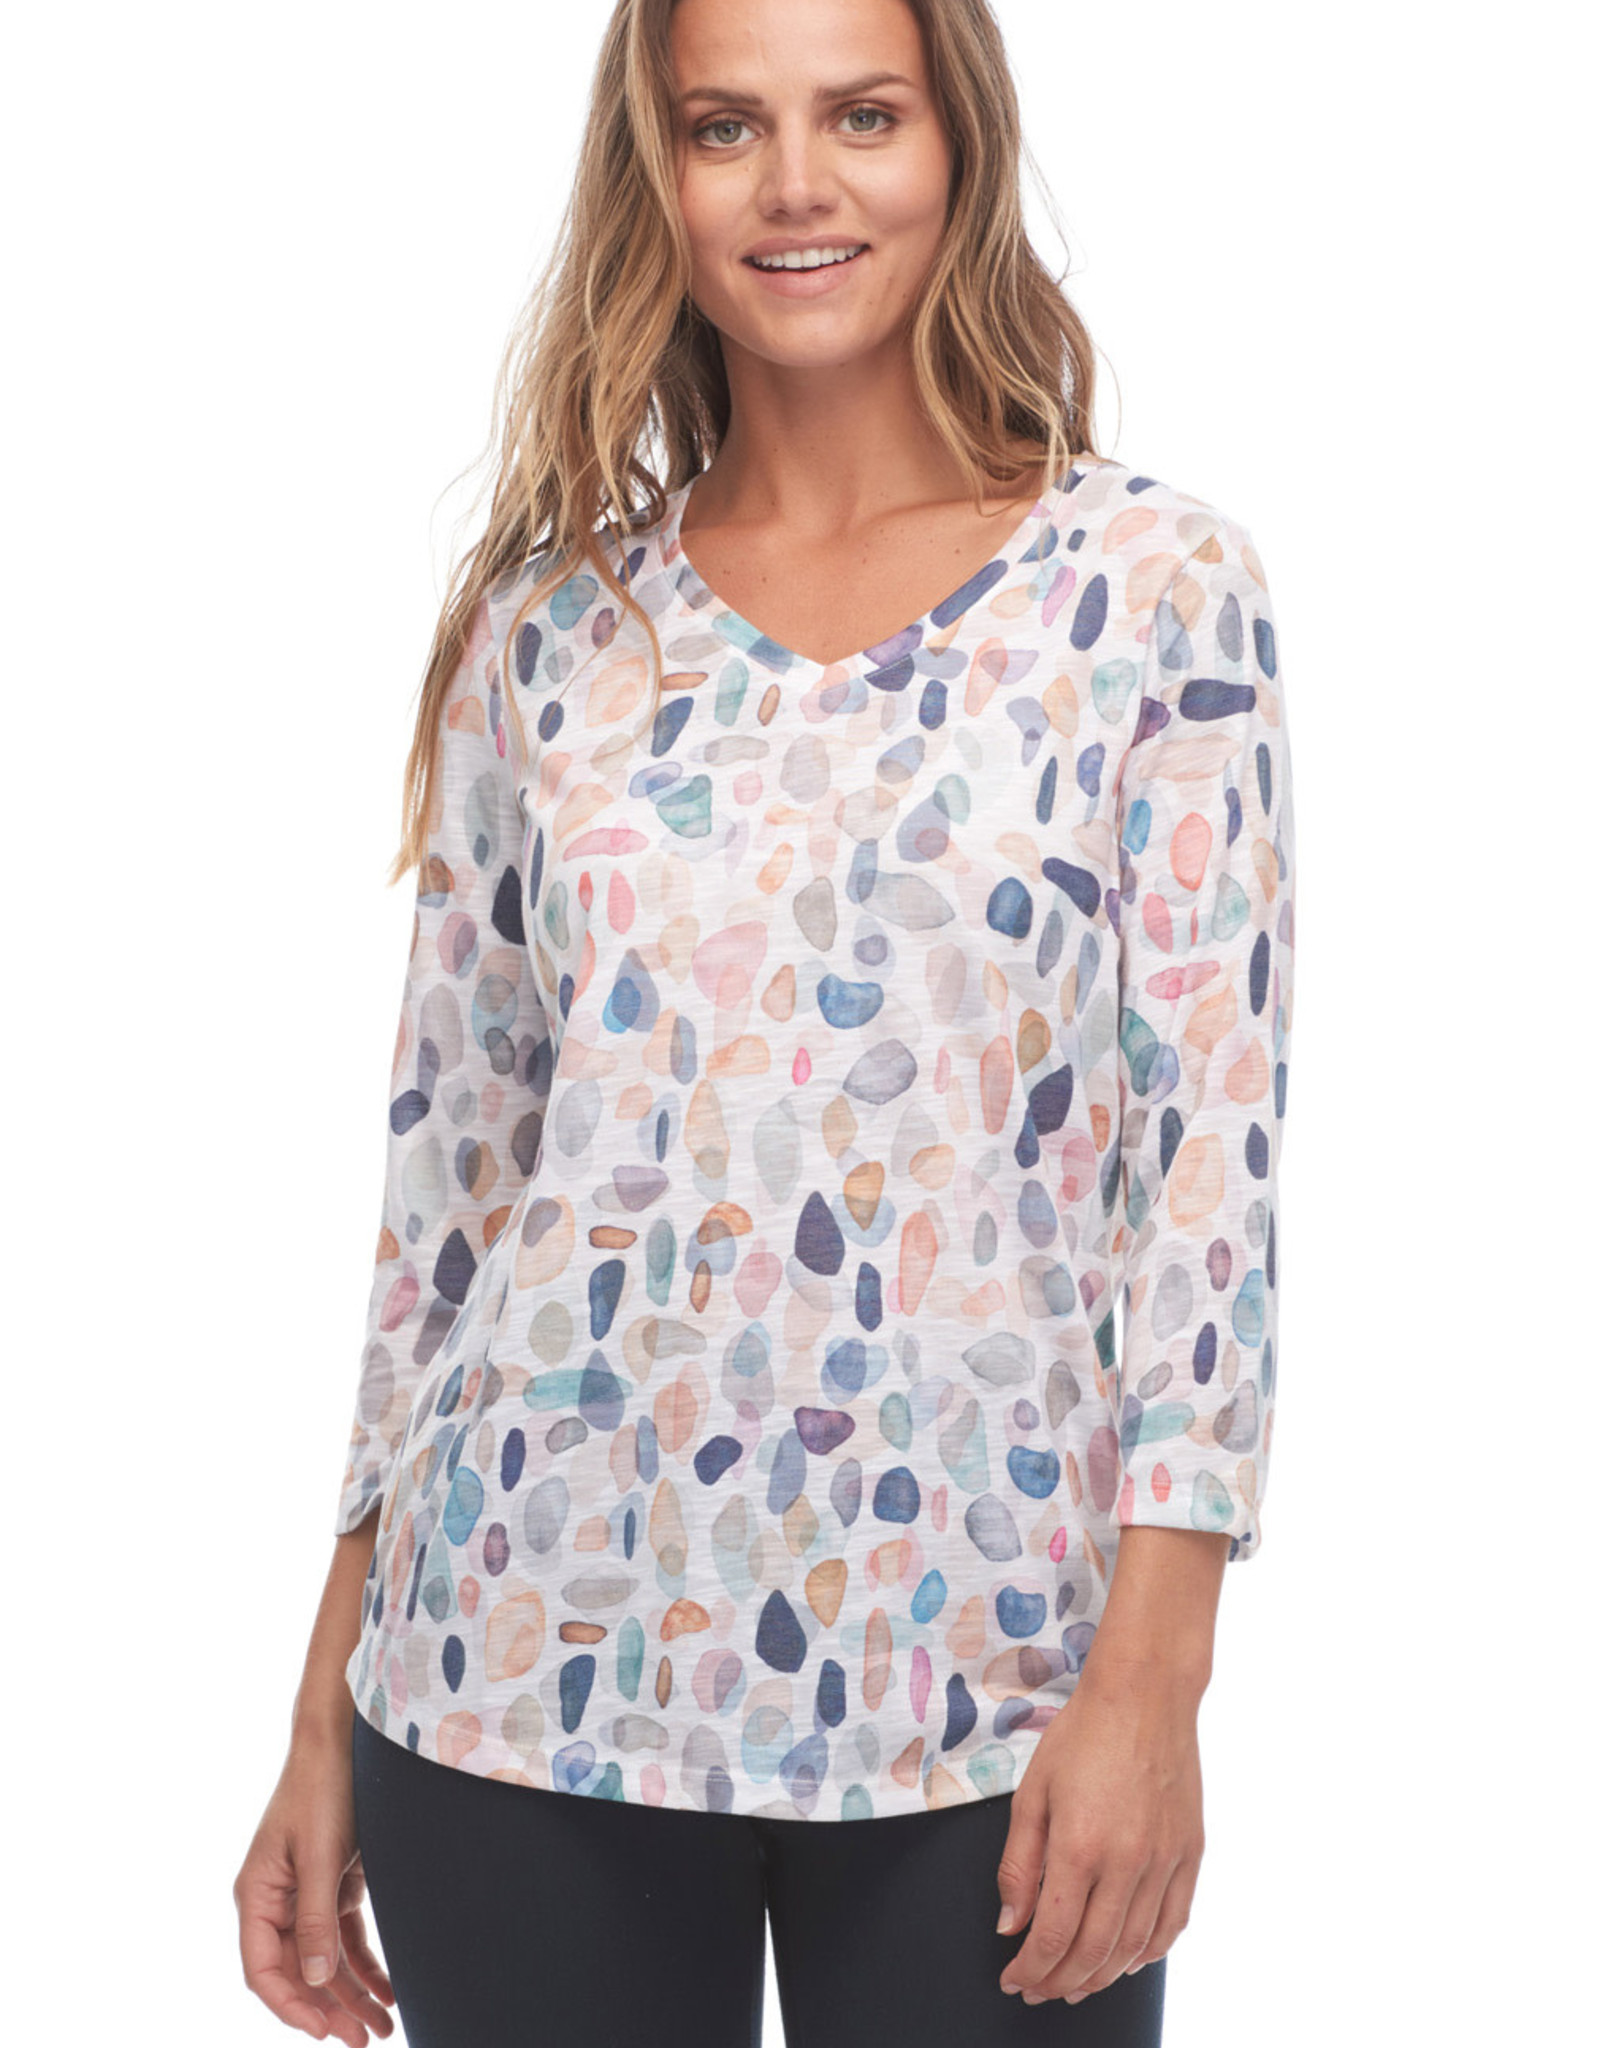 French Dressing Jeans FDJ 1292830 Seaside Pebbles Print Top